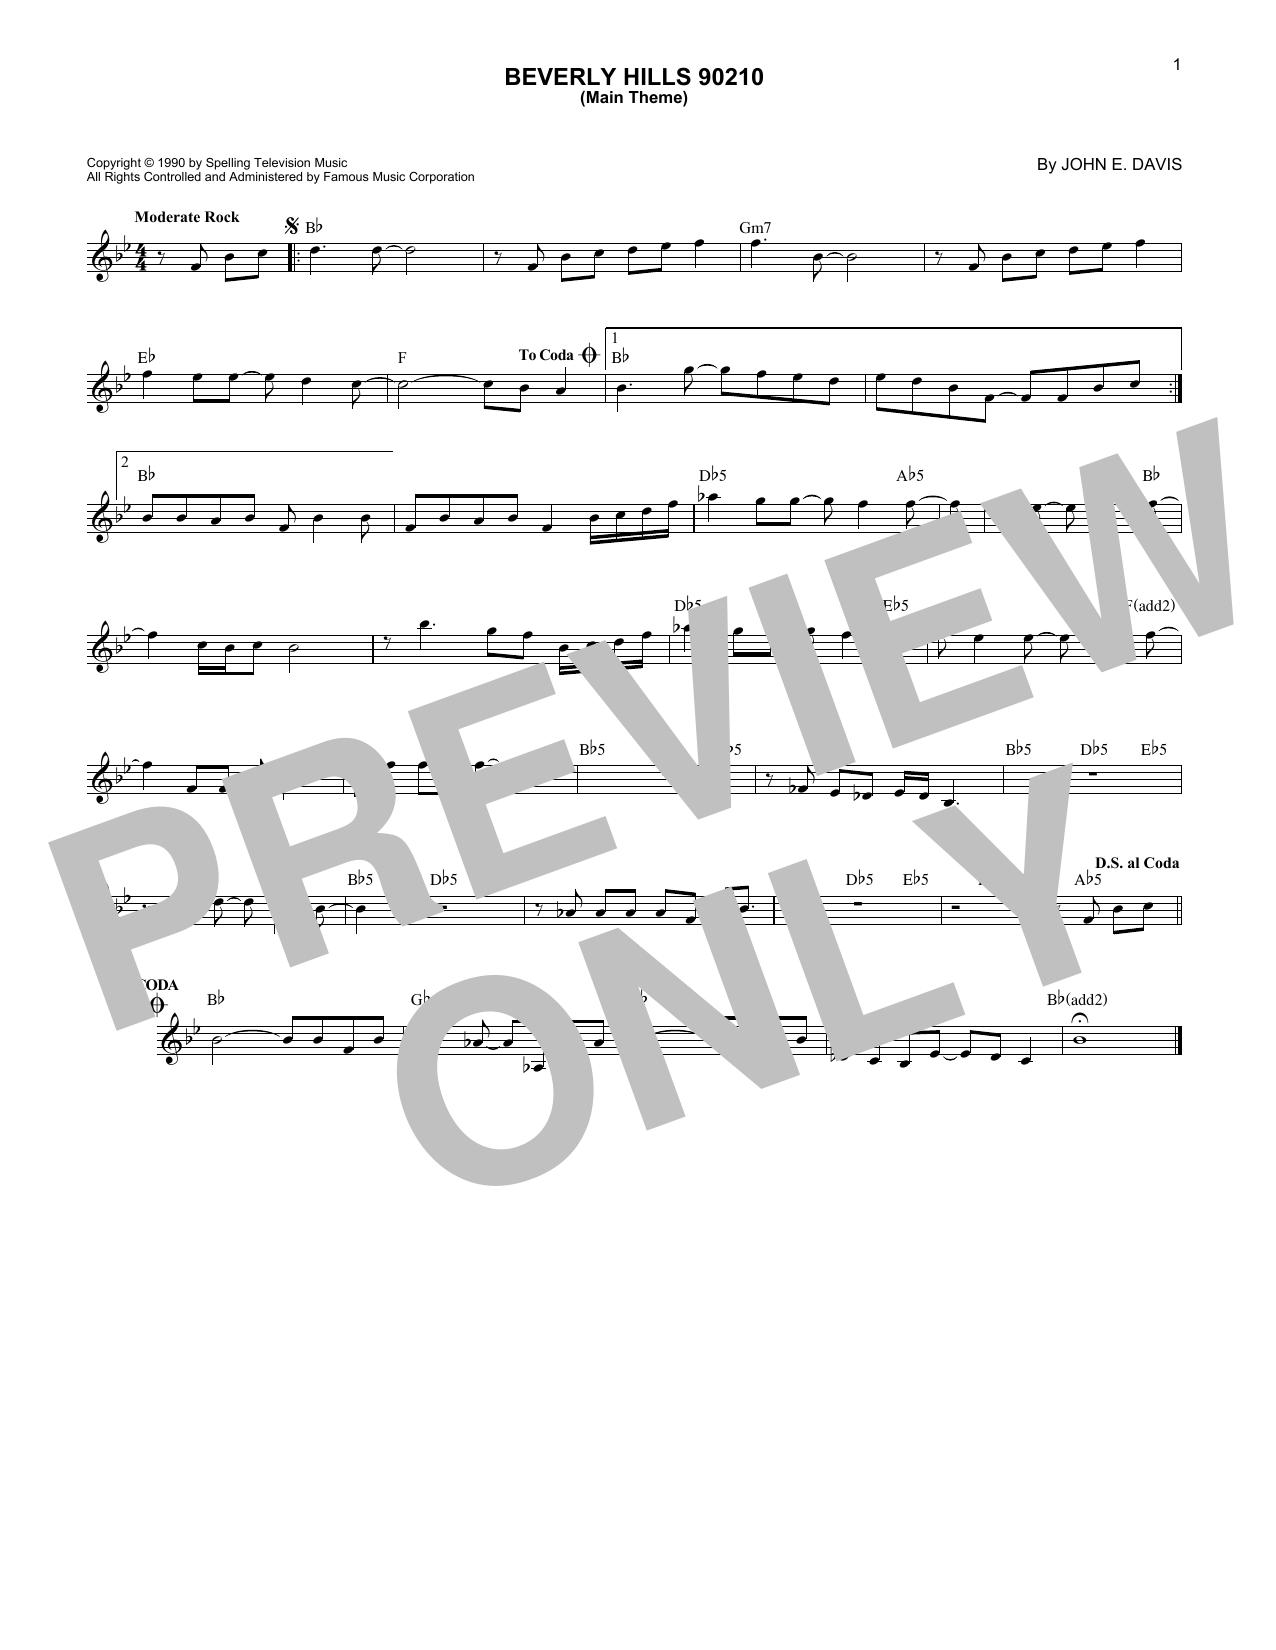 Beverly Hills 90210 (Main Theme) Sheet Music